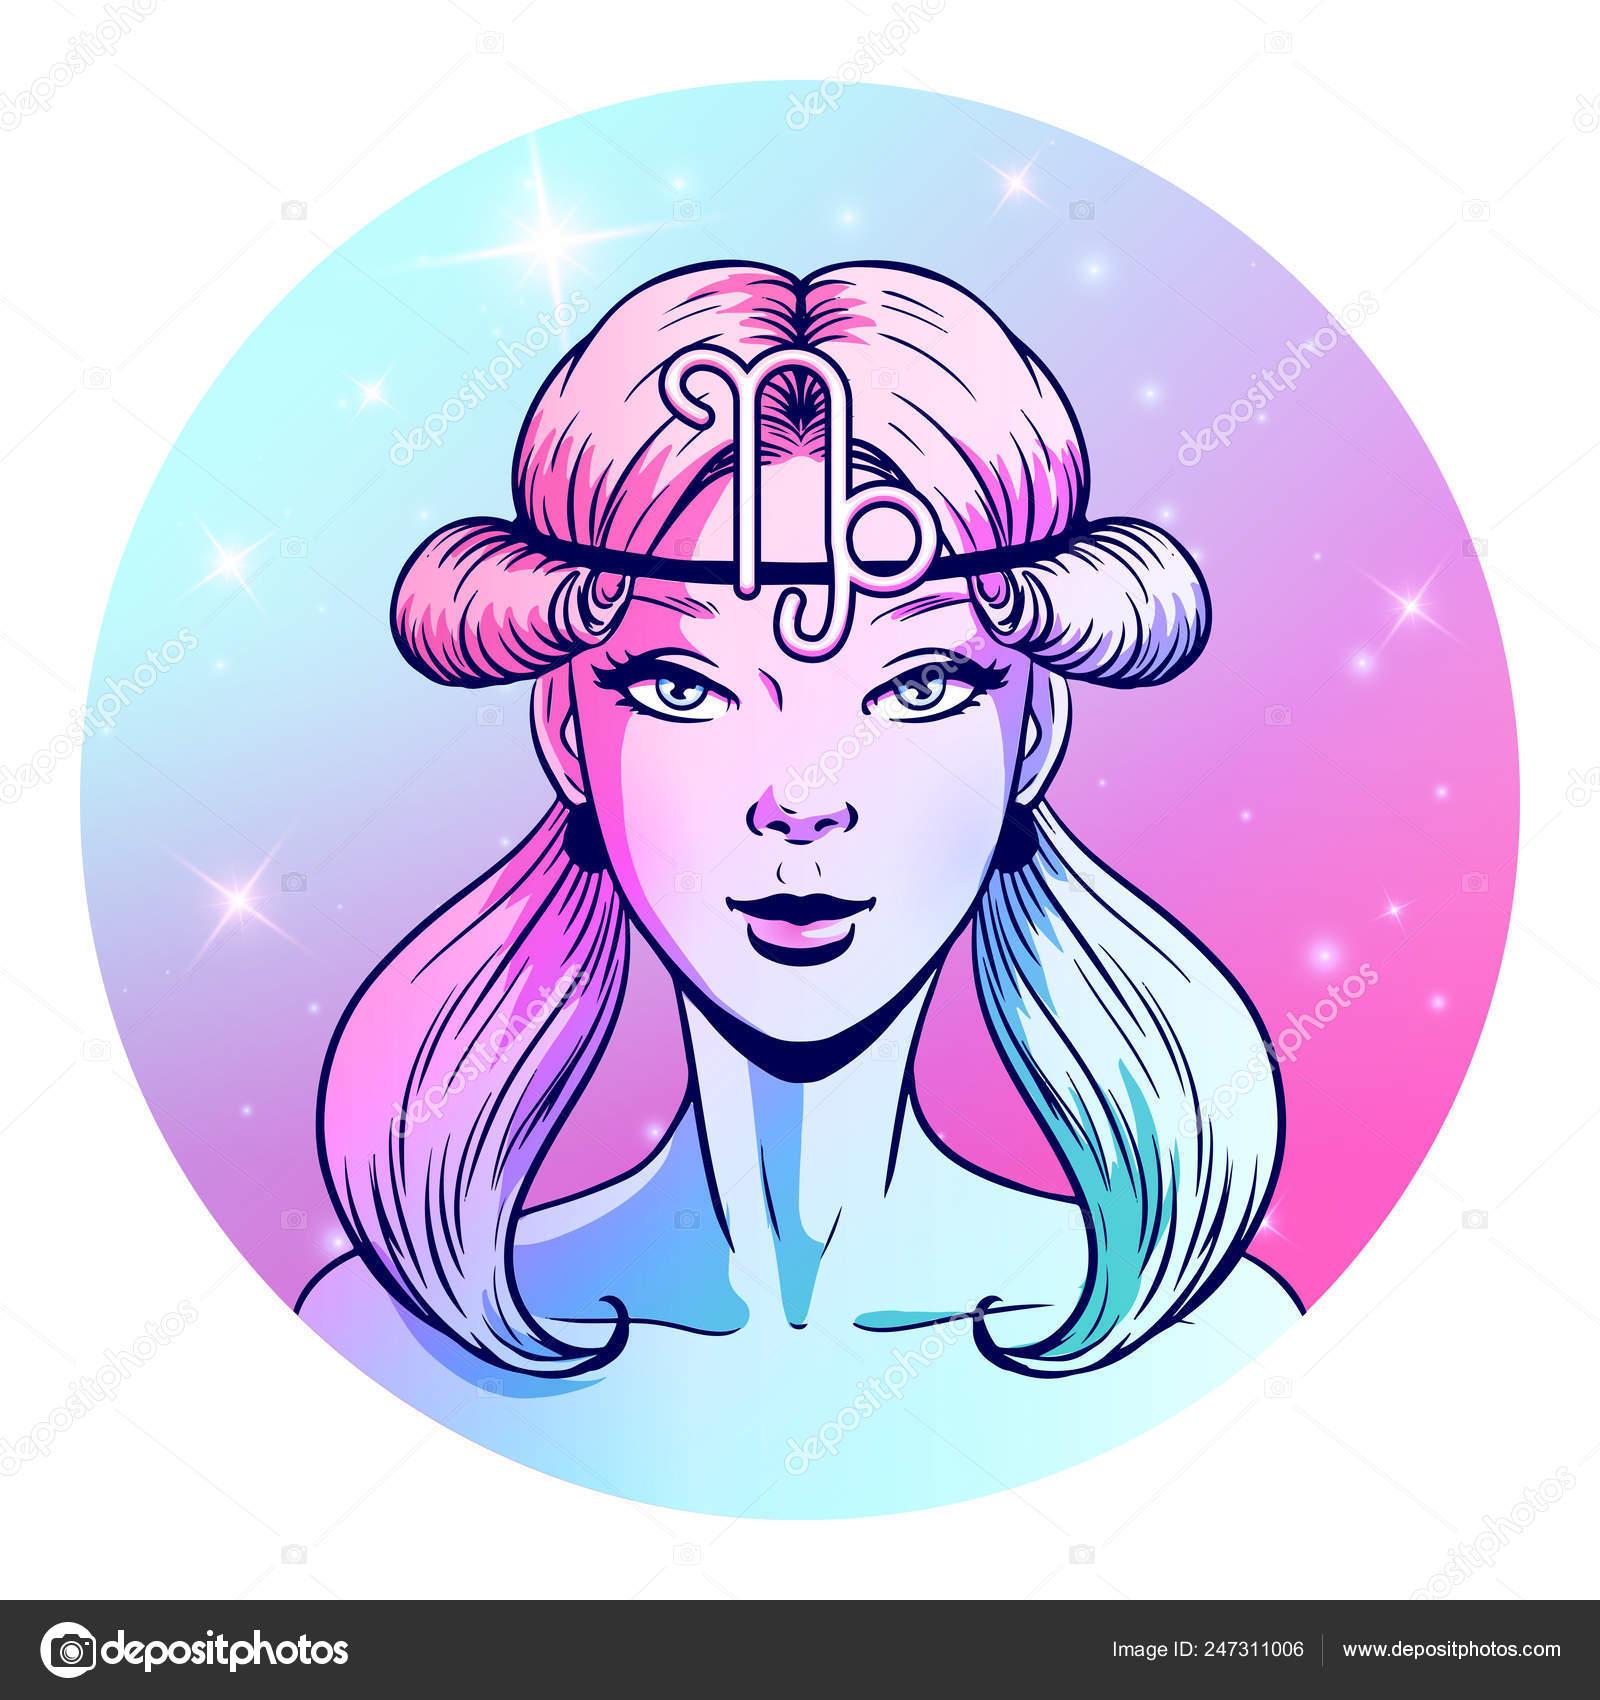 Capricorn Zodiac Sign Artwork Beautiful Girl Face Horoscope